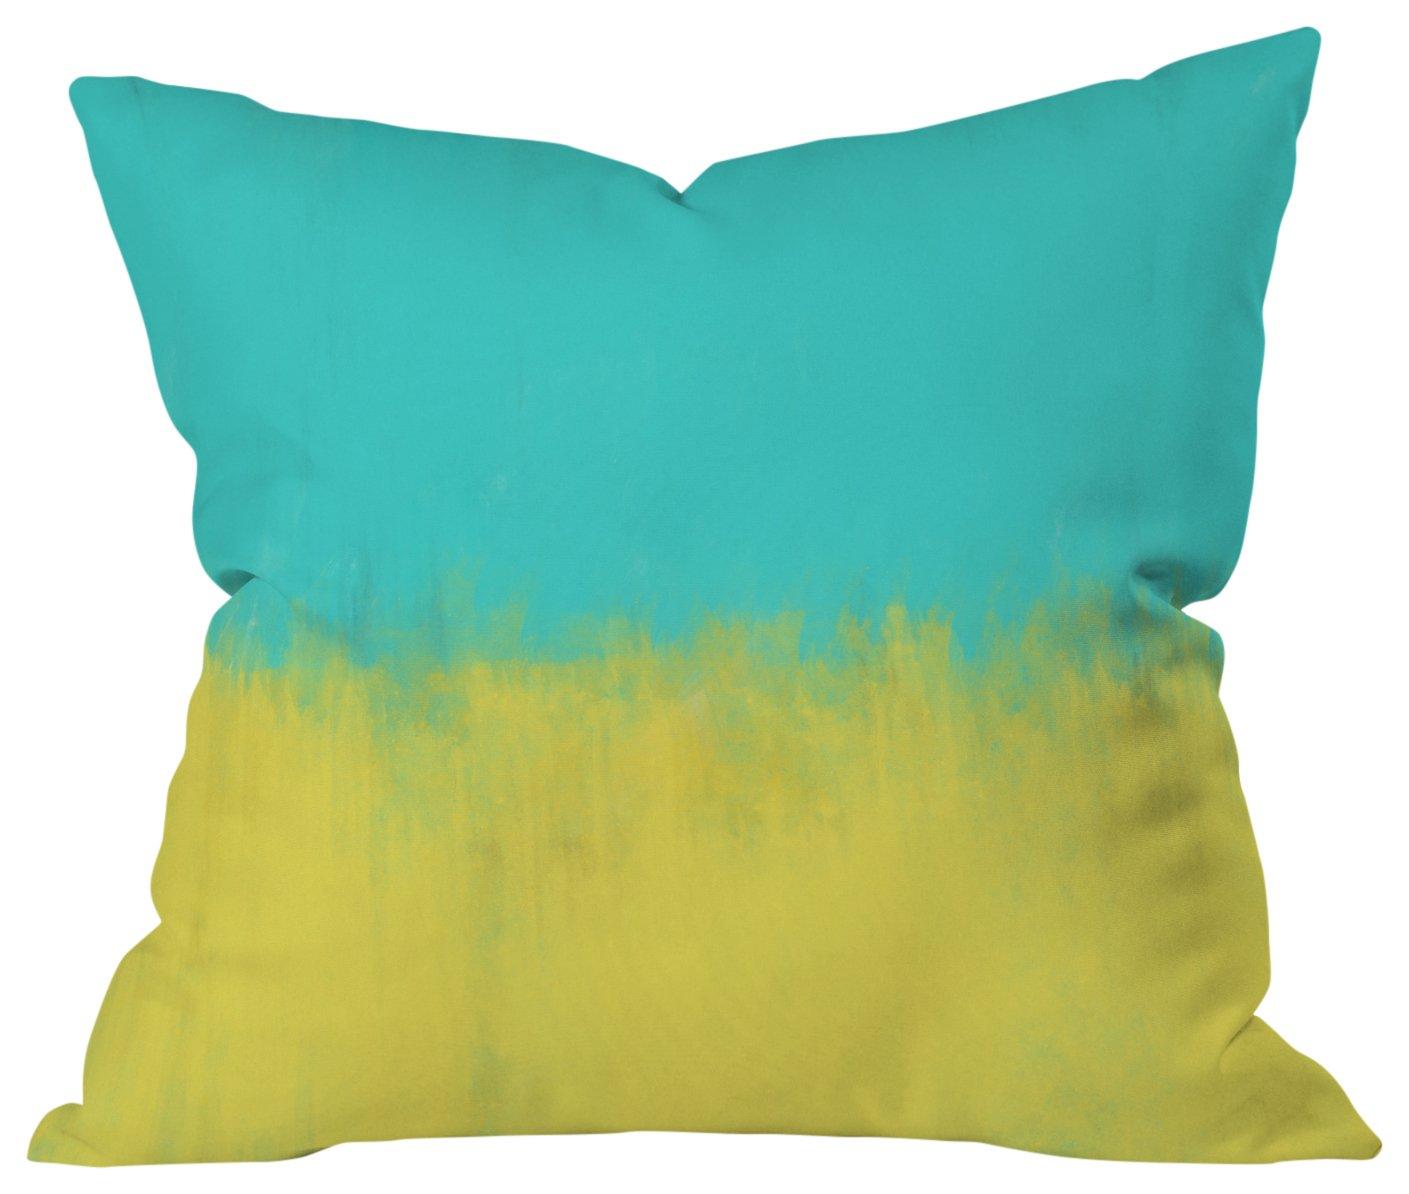 Deny Designs 52321-othrp16 Allyson Johnson Caribbean Indoor Throw Pillow, 16 x 16